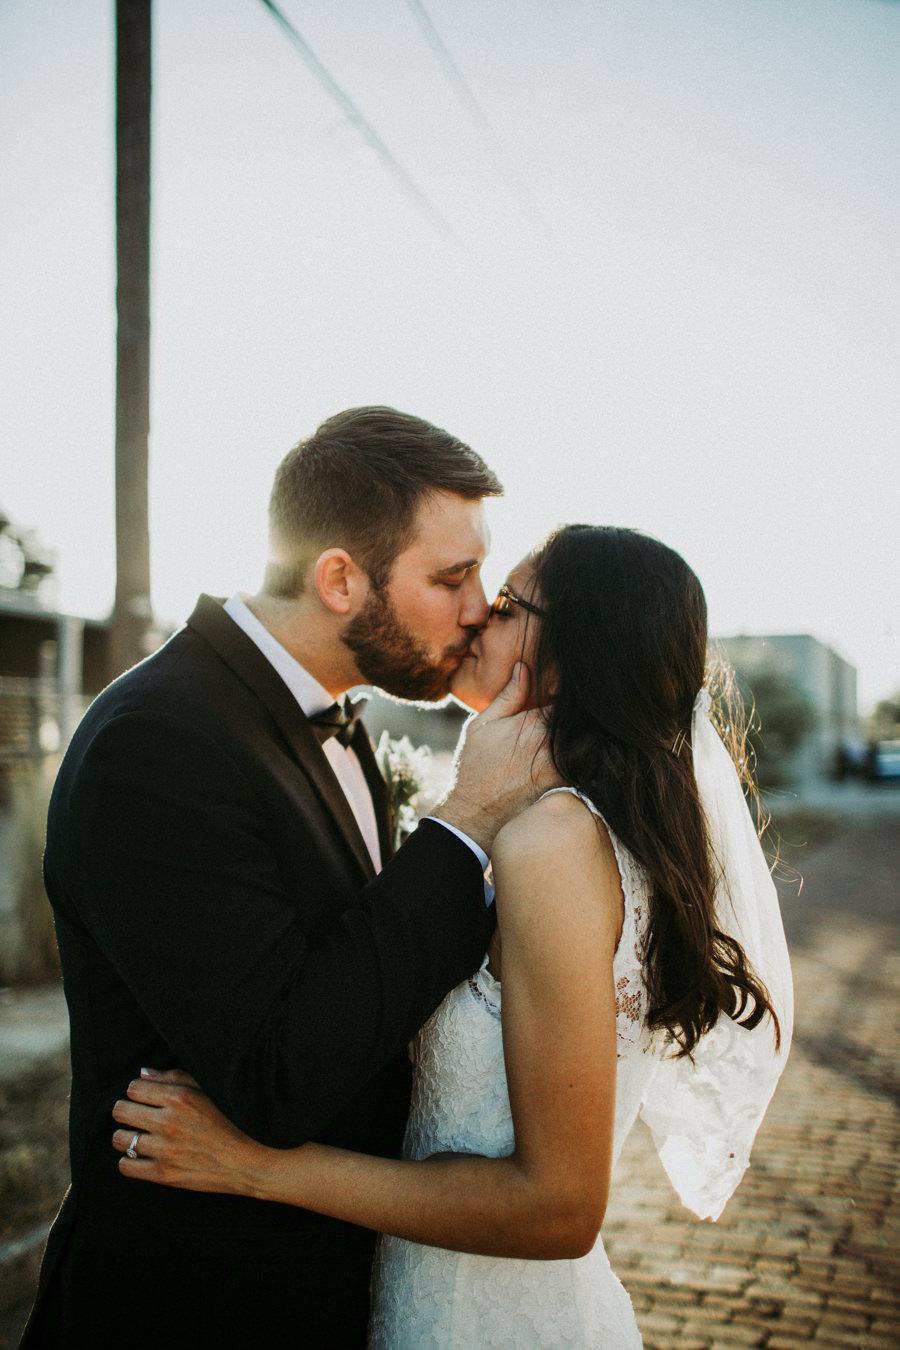 Tampa Heights Industrial Wedding at Cavu Emmy RJ-162.jpg